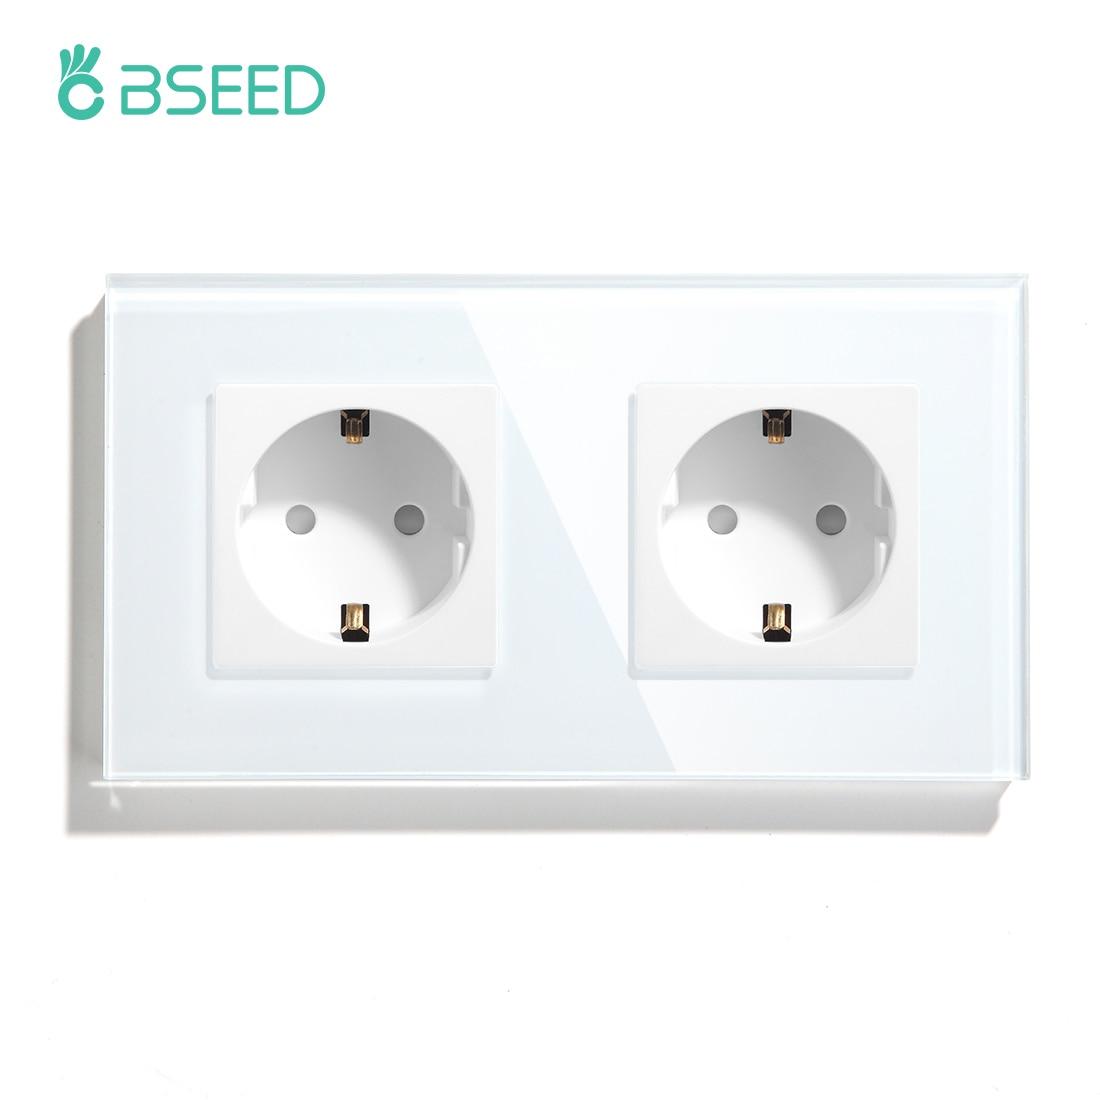 BSEED EU Standard Wall Double Socket EU Socket 16A 110V-240V 3 Colors White Black Gloden Crystal Glass Panel Free Shipping